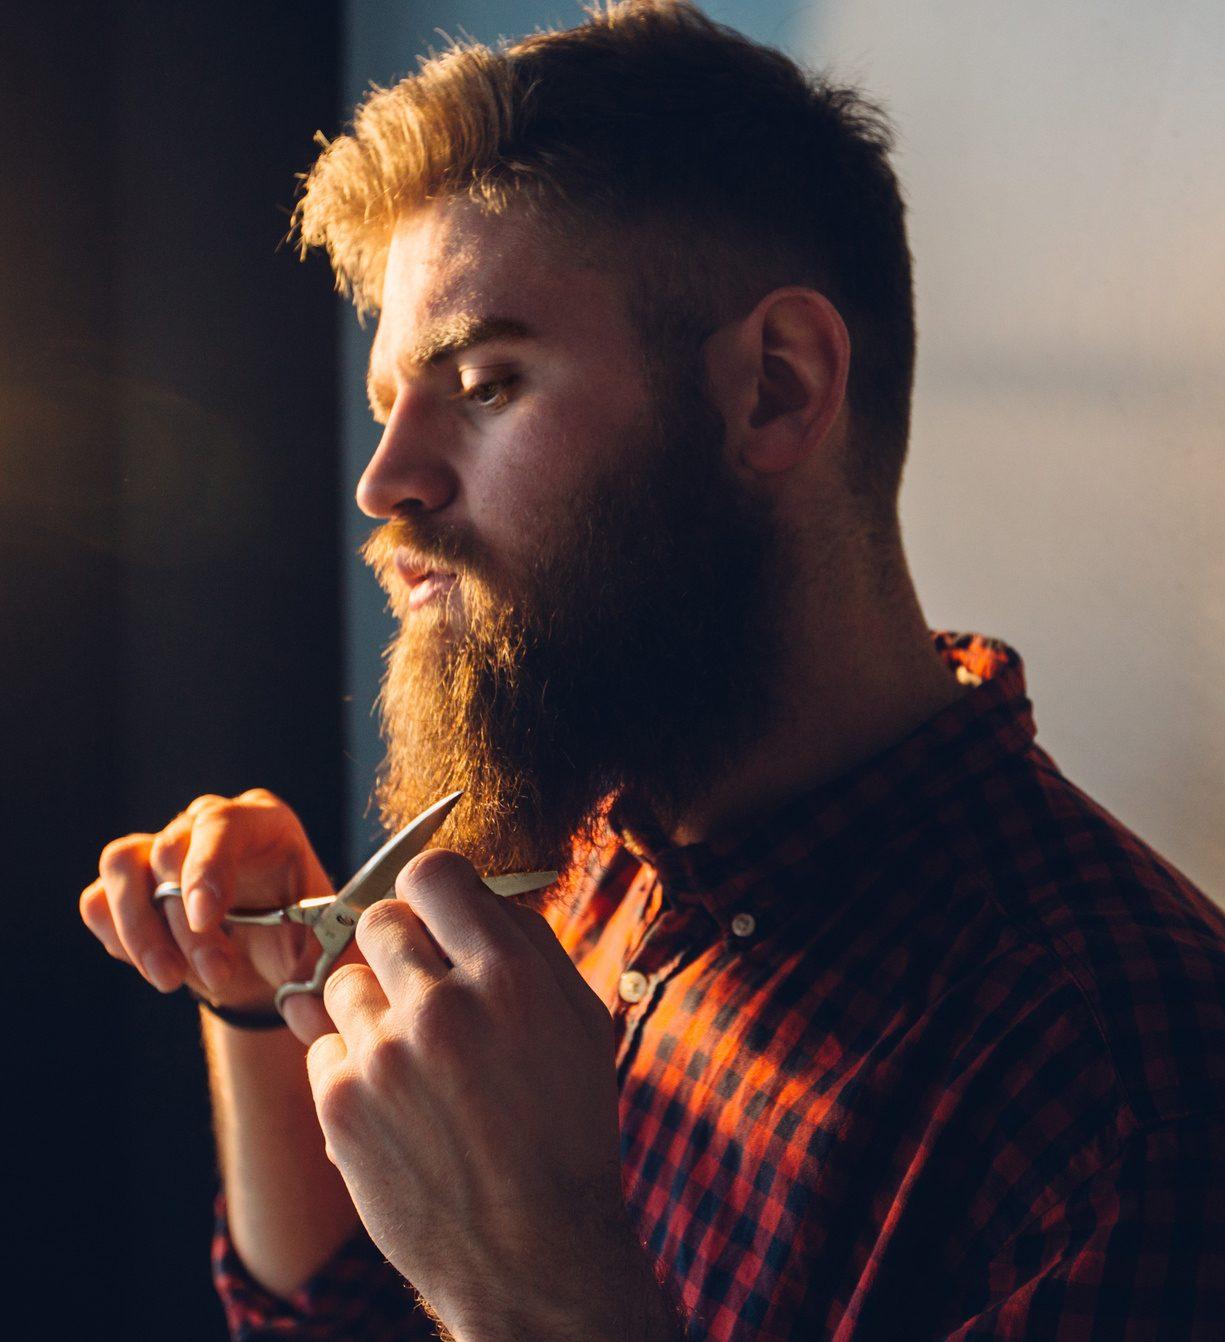 man cutting his beard with scissors